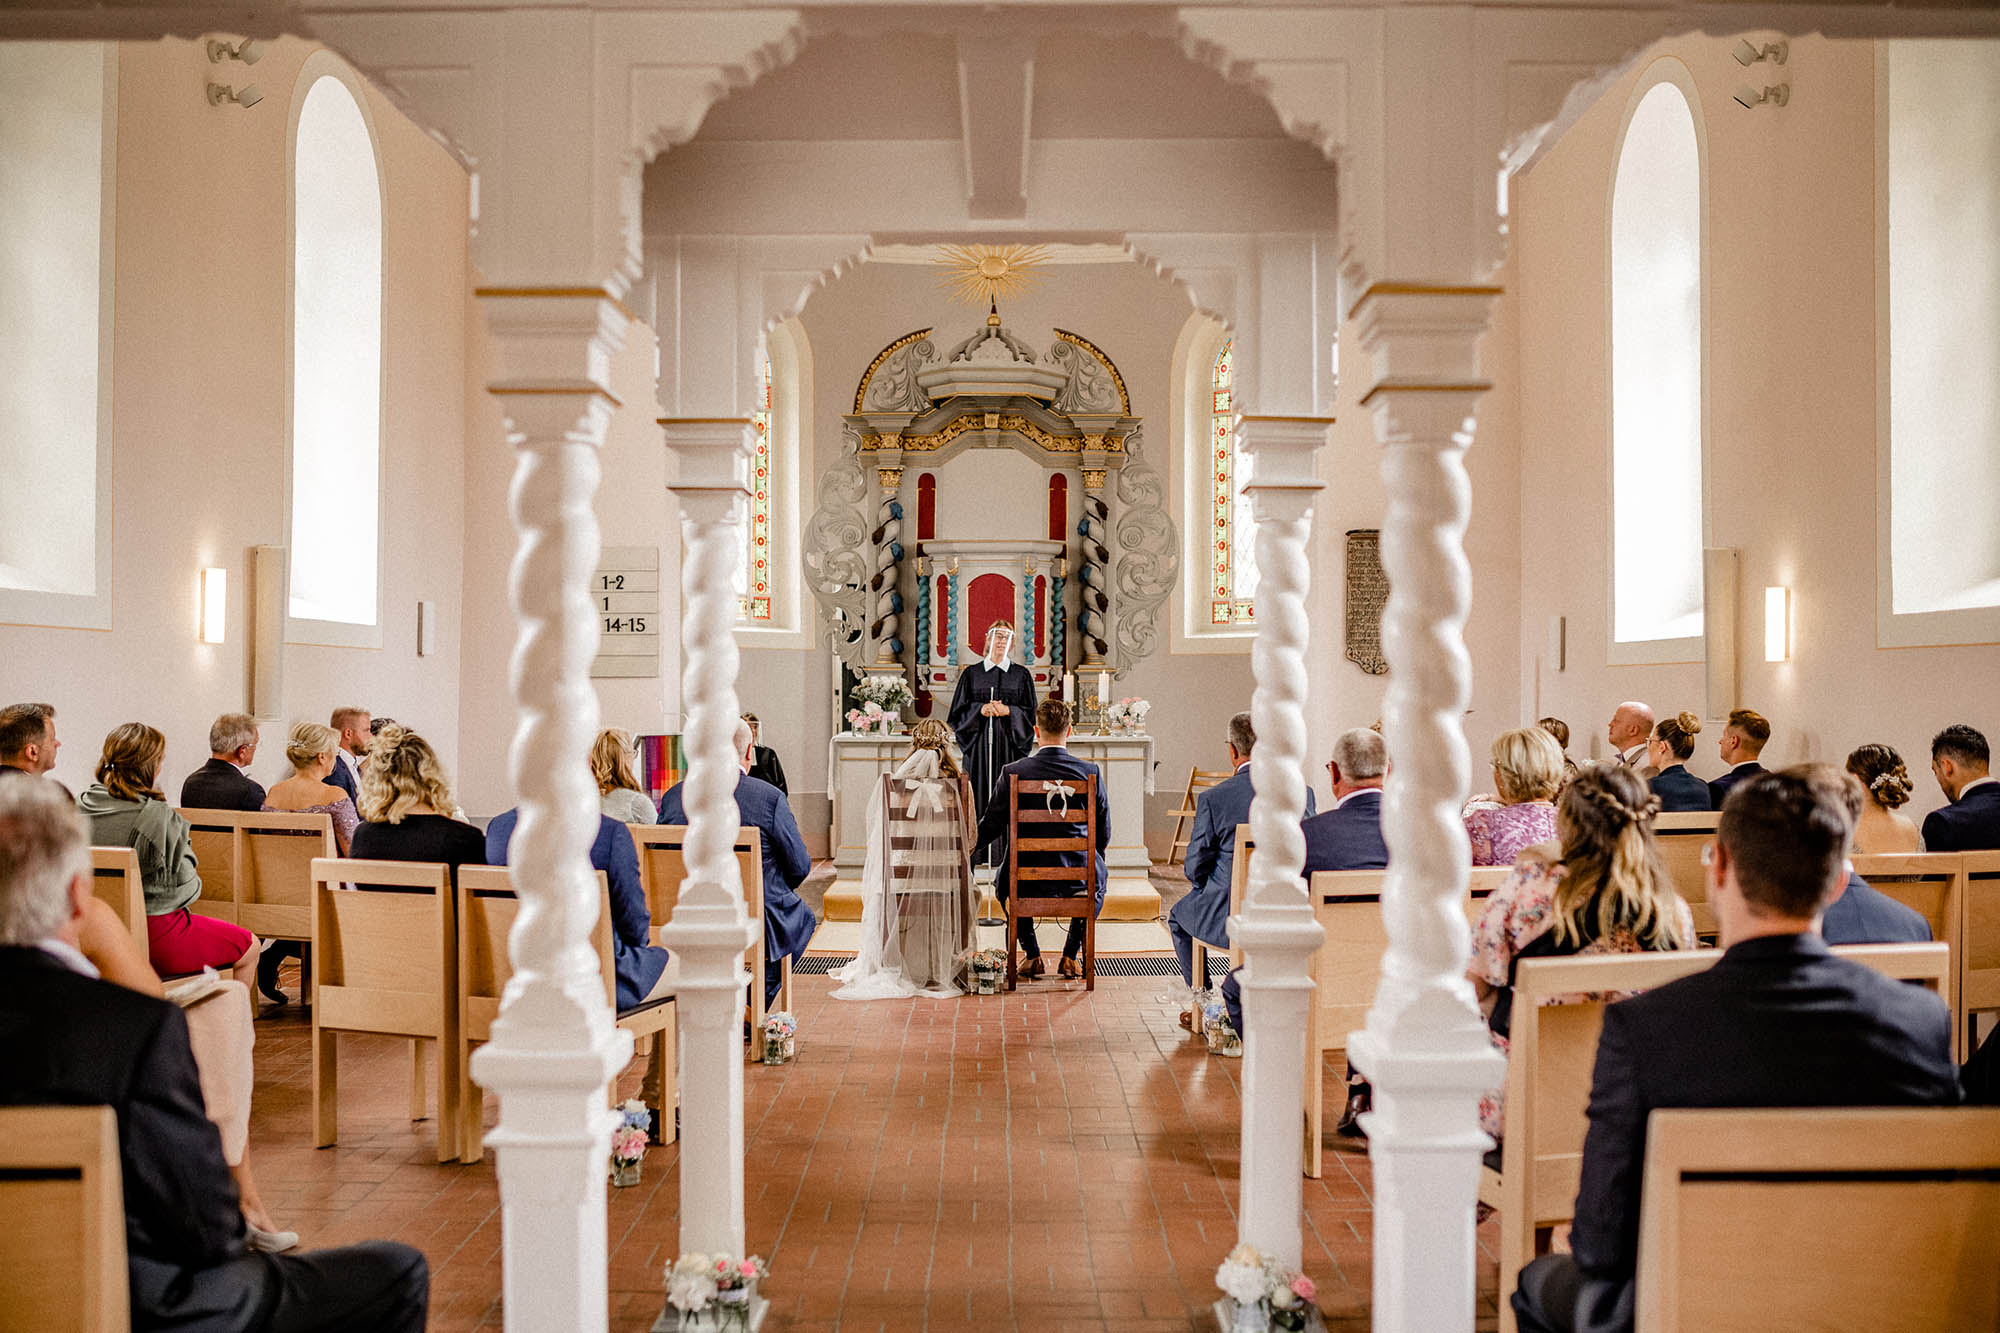 Virginia-Pech-Fotografie-Hochzeitsfotograf-Hochzeitsfotografie-Kulturscheune-Rangsdorf-Berlin-Anika-Nico-26